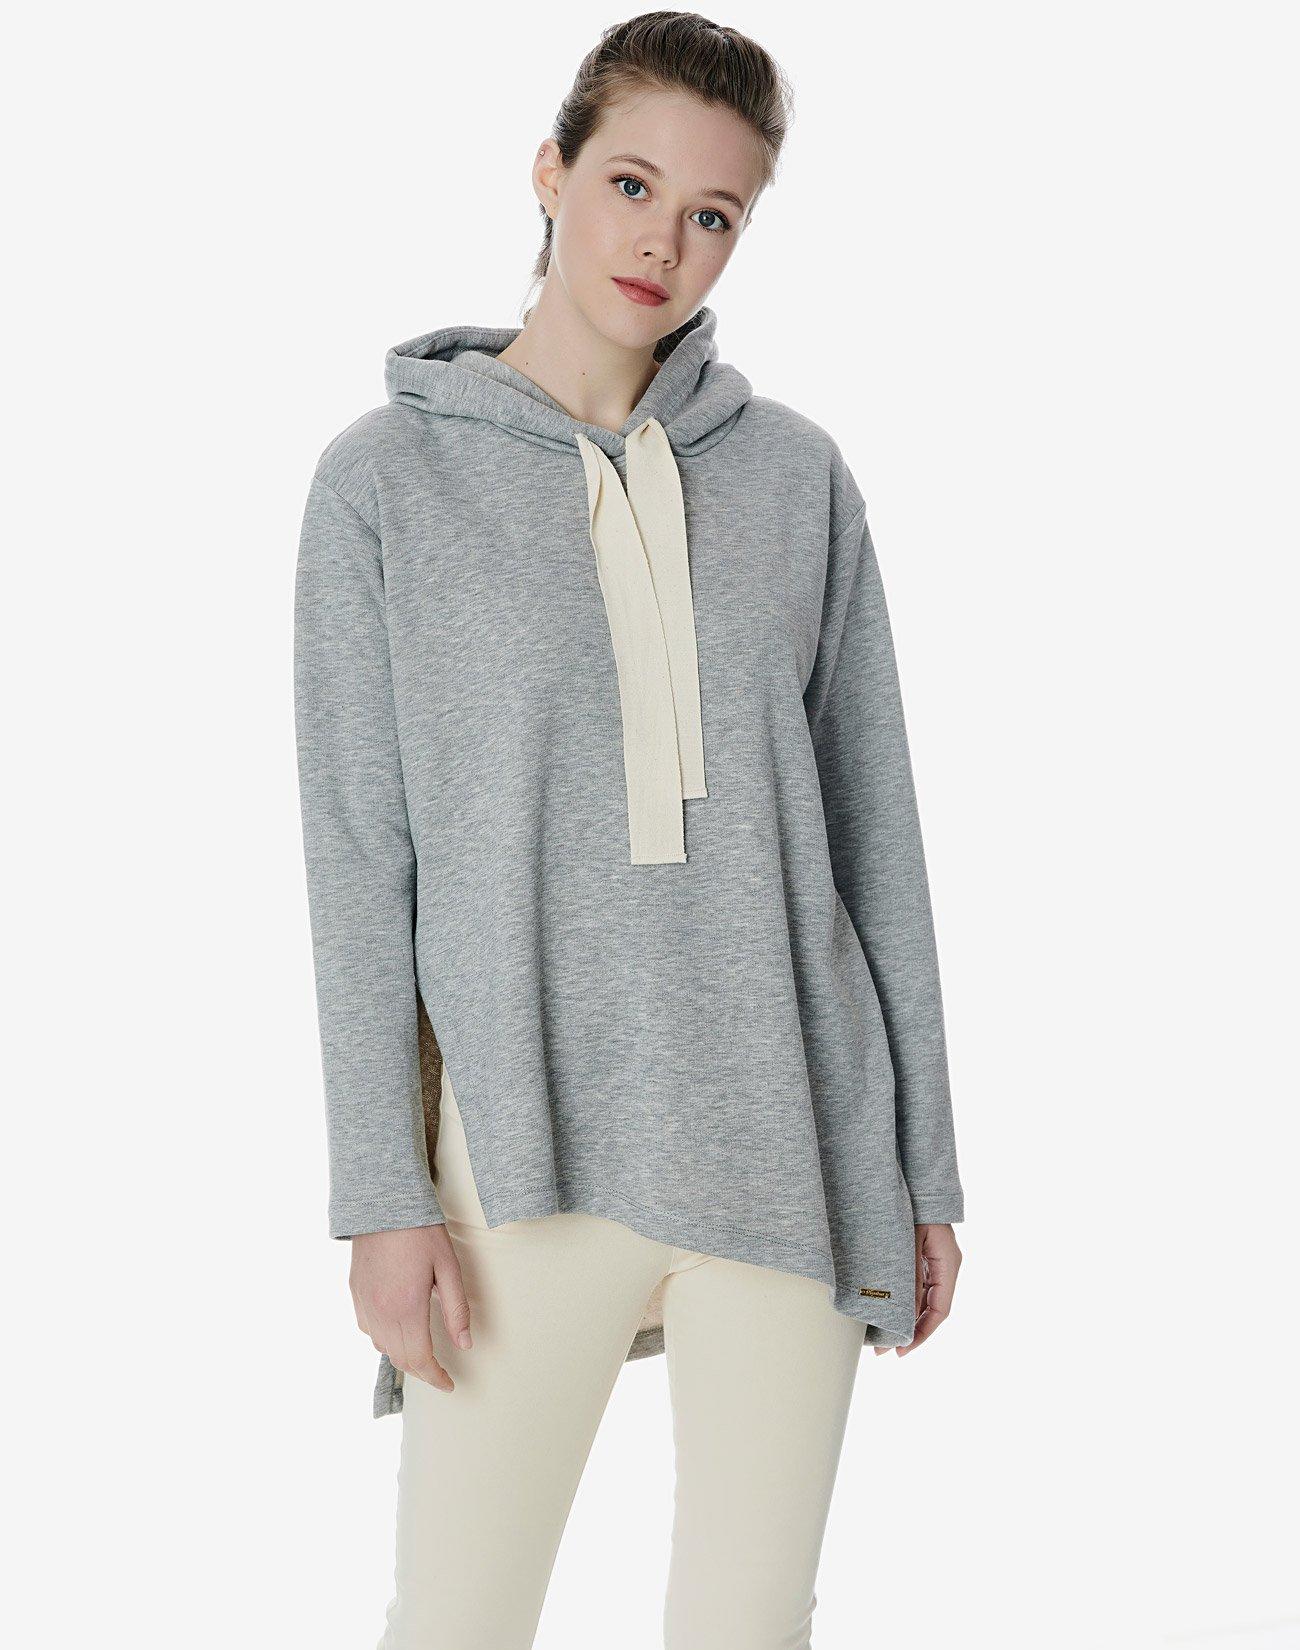 Asymmetric oversized sweatshirt